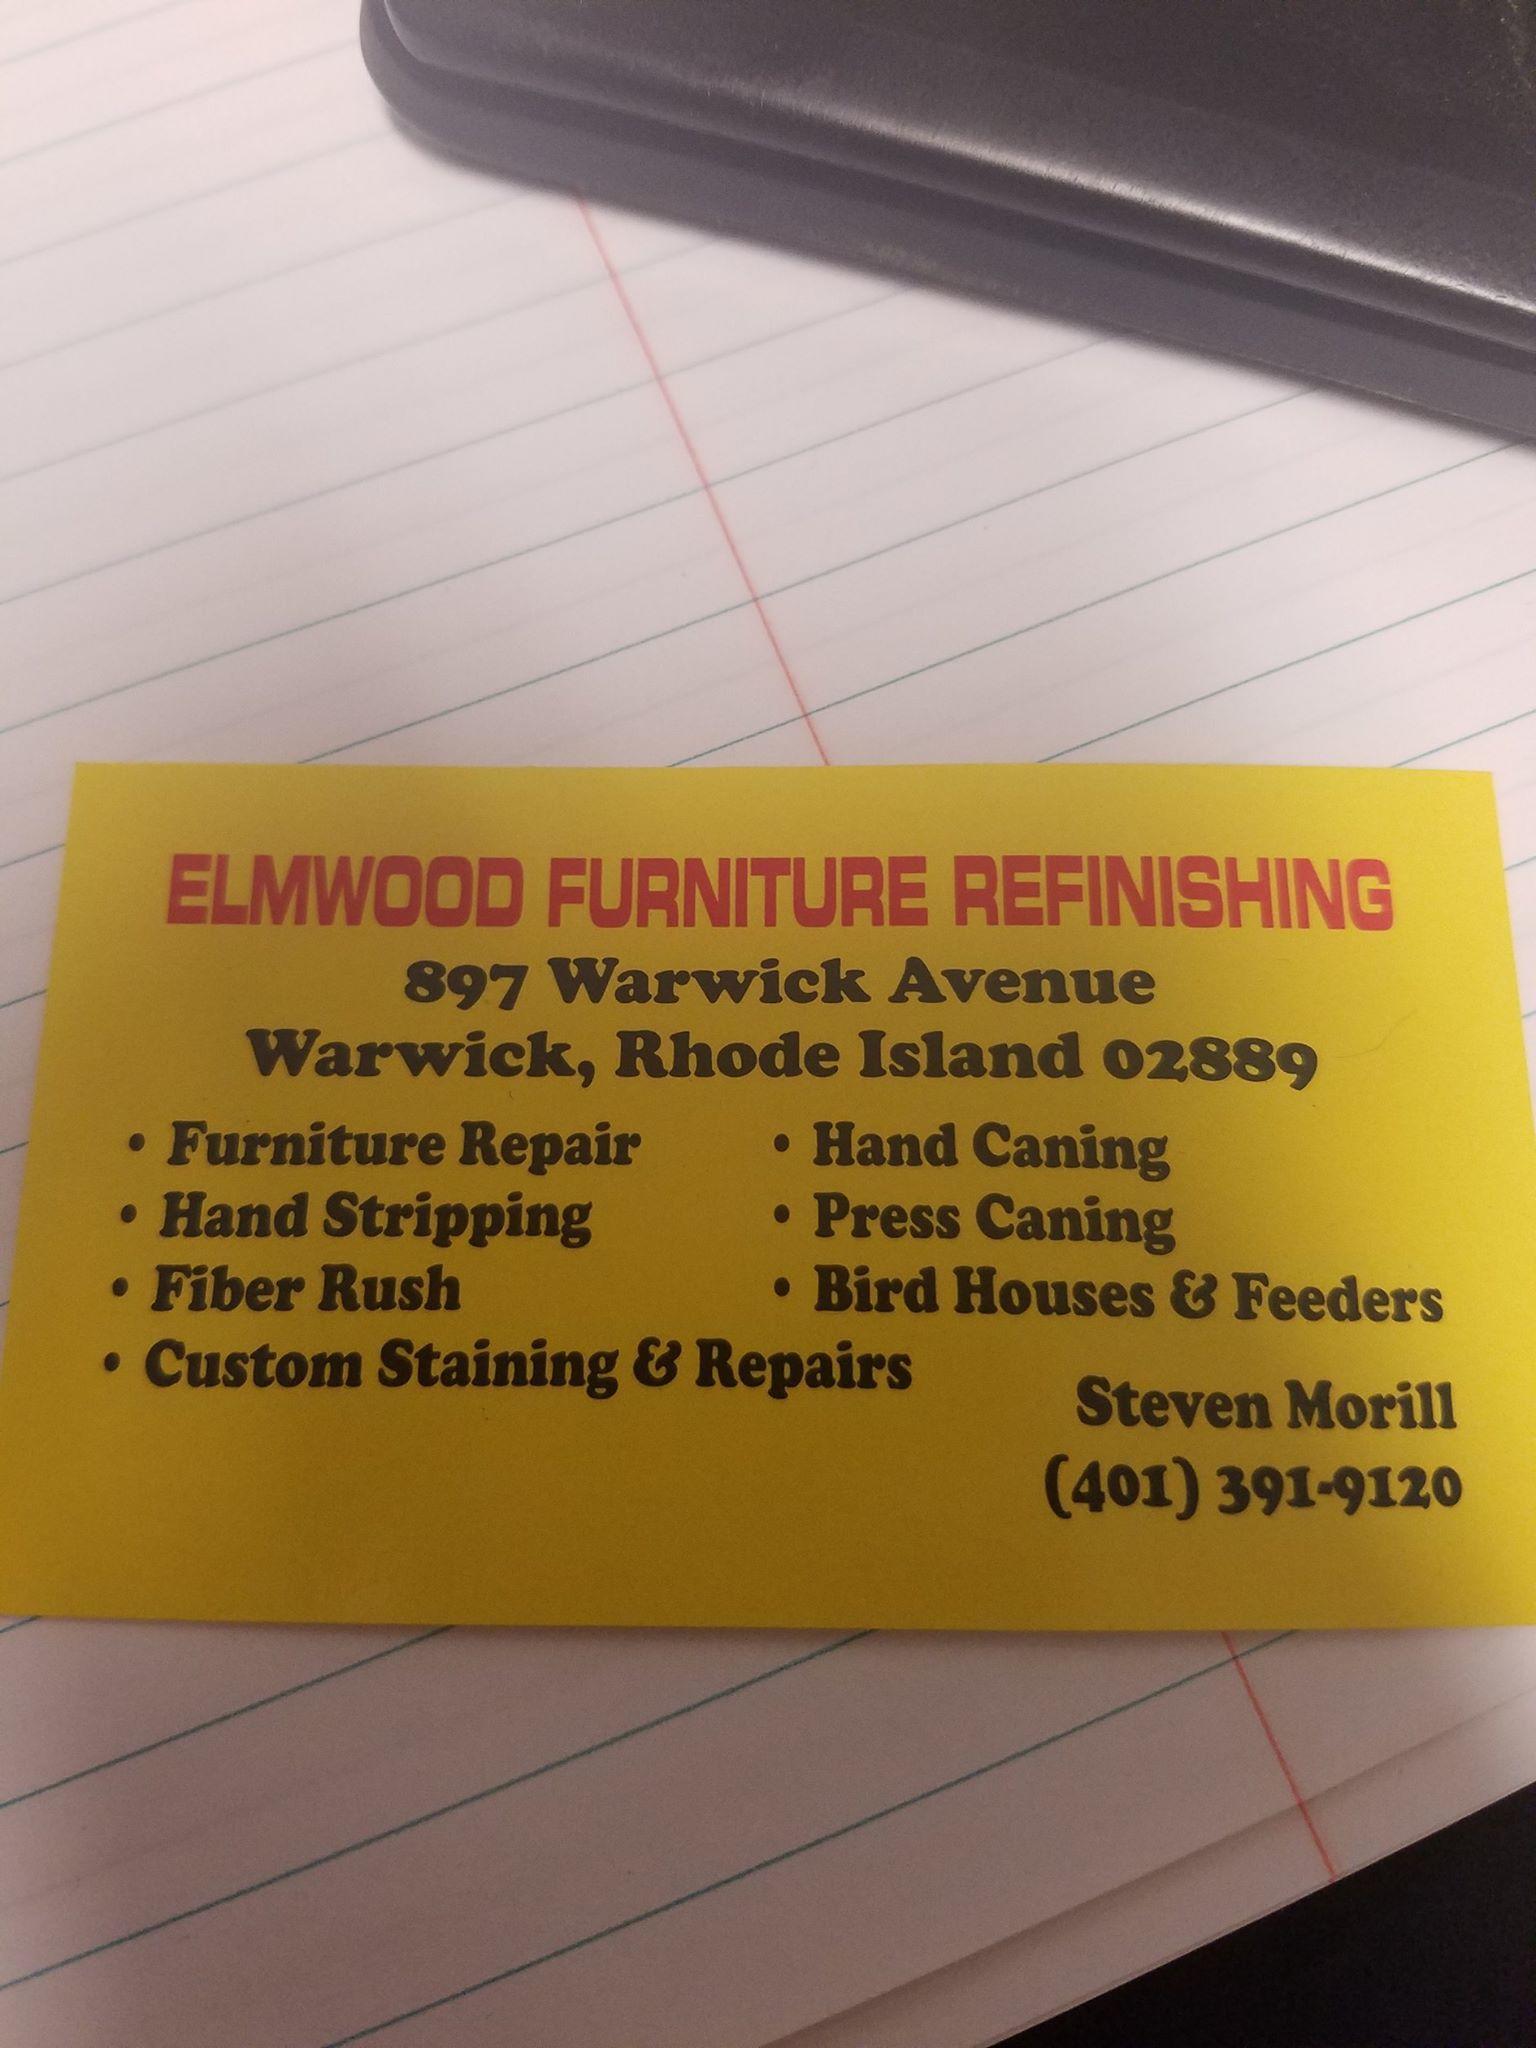 Wonderful Elmwood Furniture Refinishing 897 Warwick Ave. Warwick, RI Furniture Stores    MapQuest